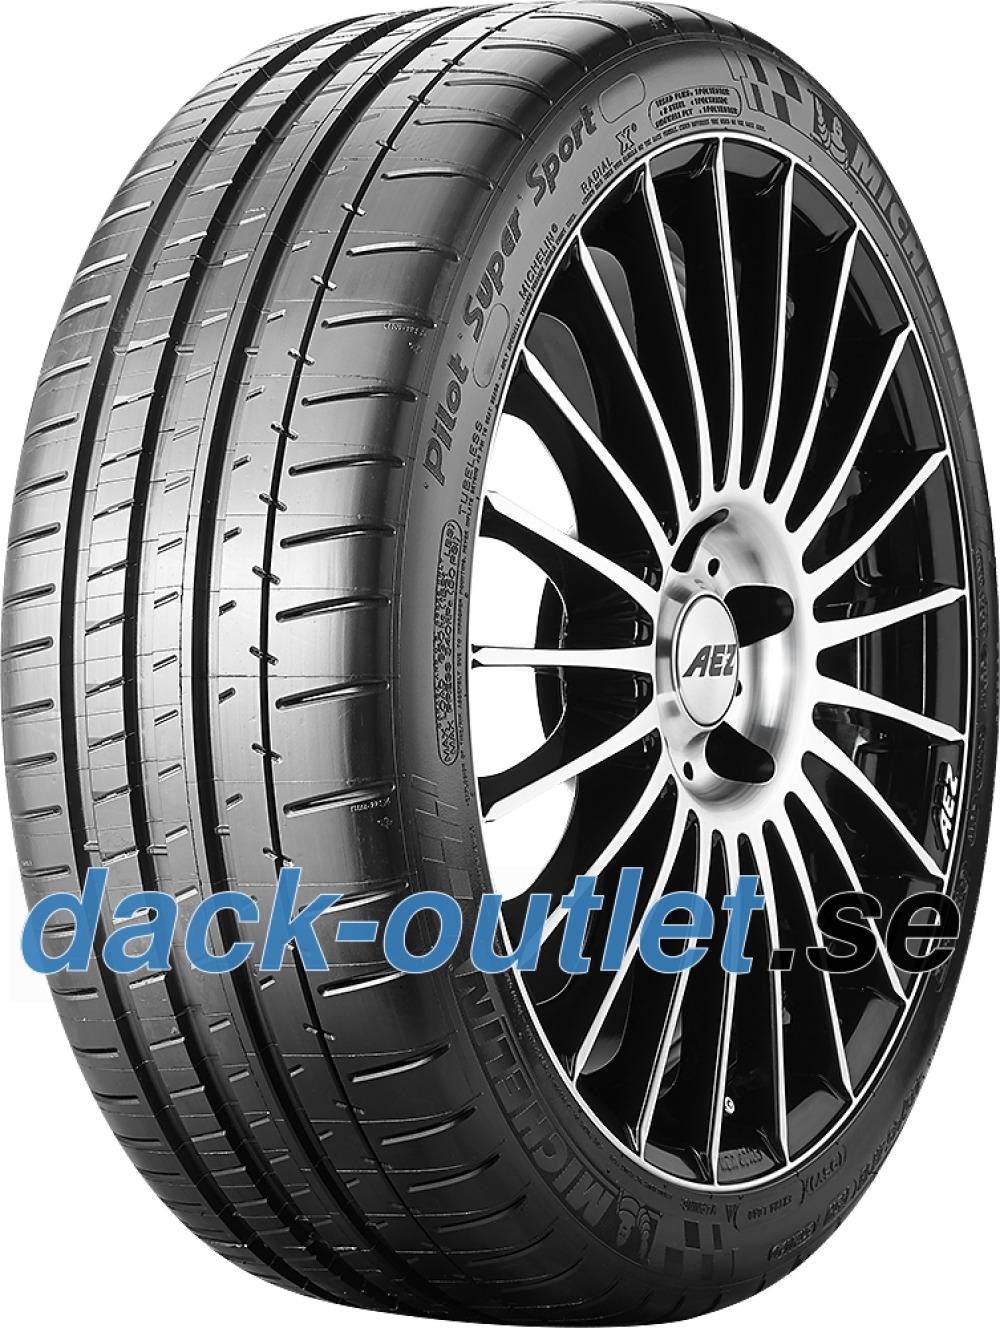 Michelin Pilot Super Sport ( 295/30 ZR20 (101Y) XL MO, med fälg skyddslist (FSL) )